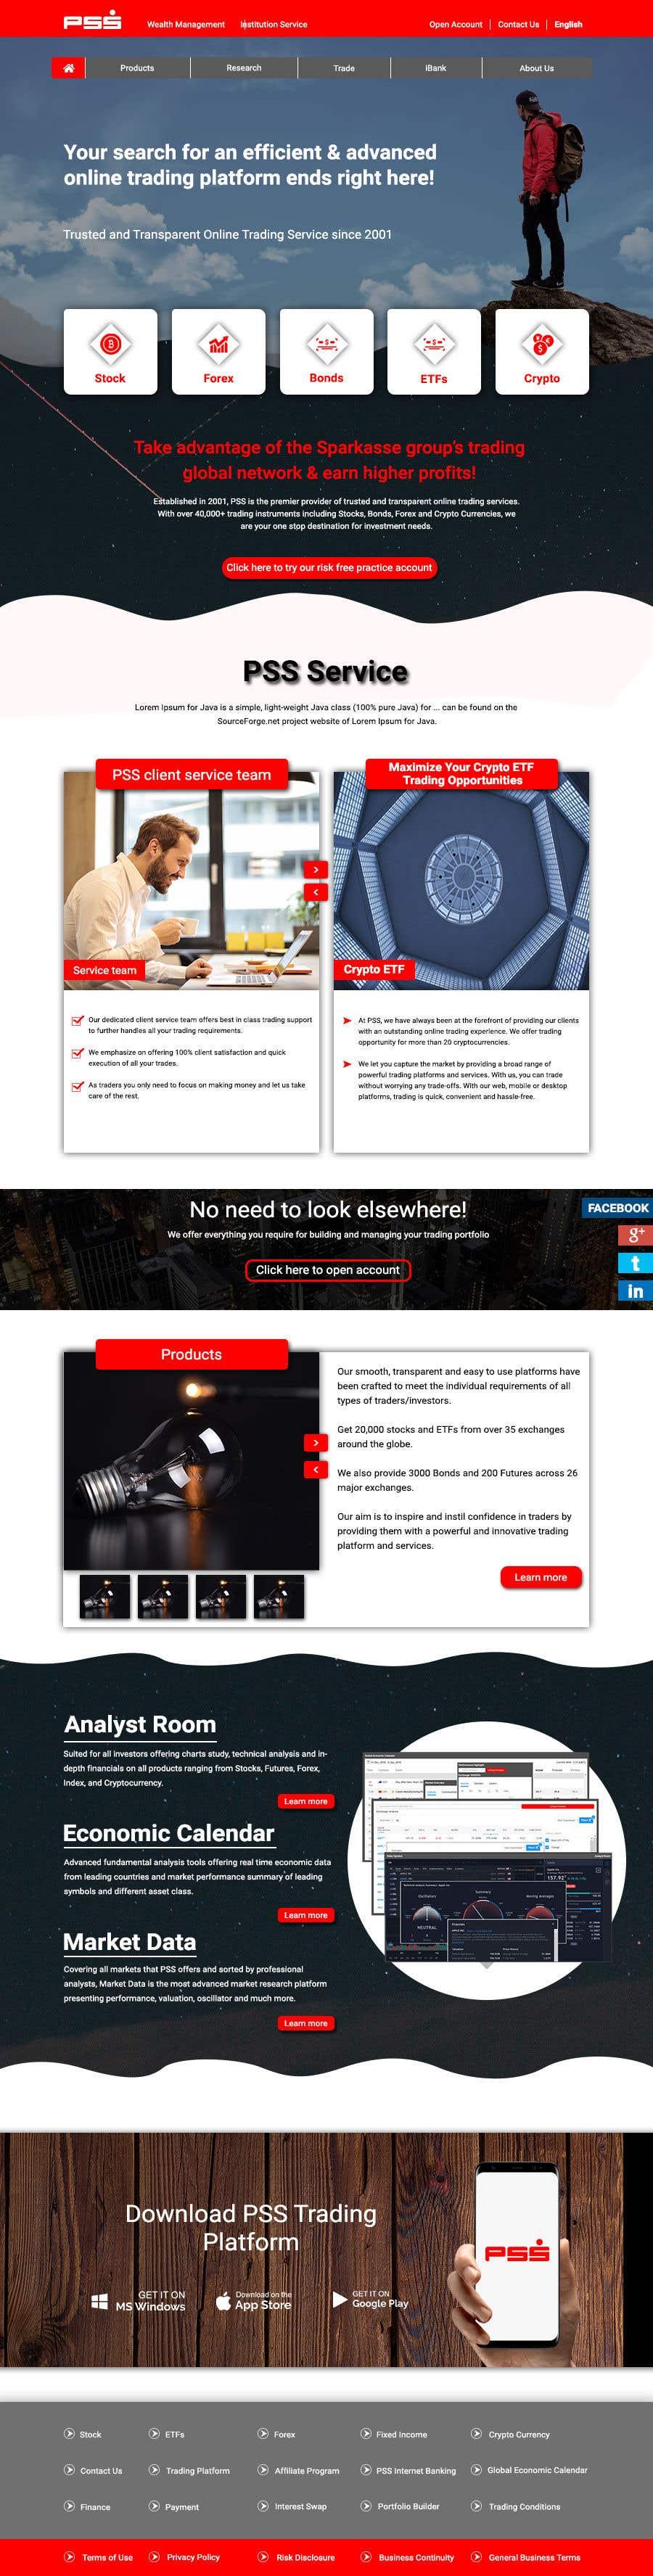 "Intrarea #20 pentru concursul ""Home page design for existing site"""